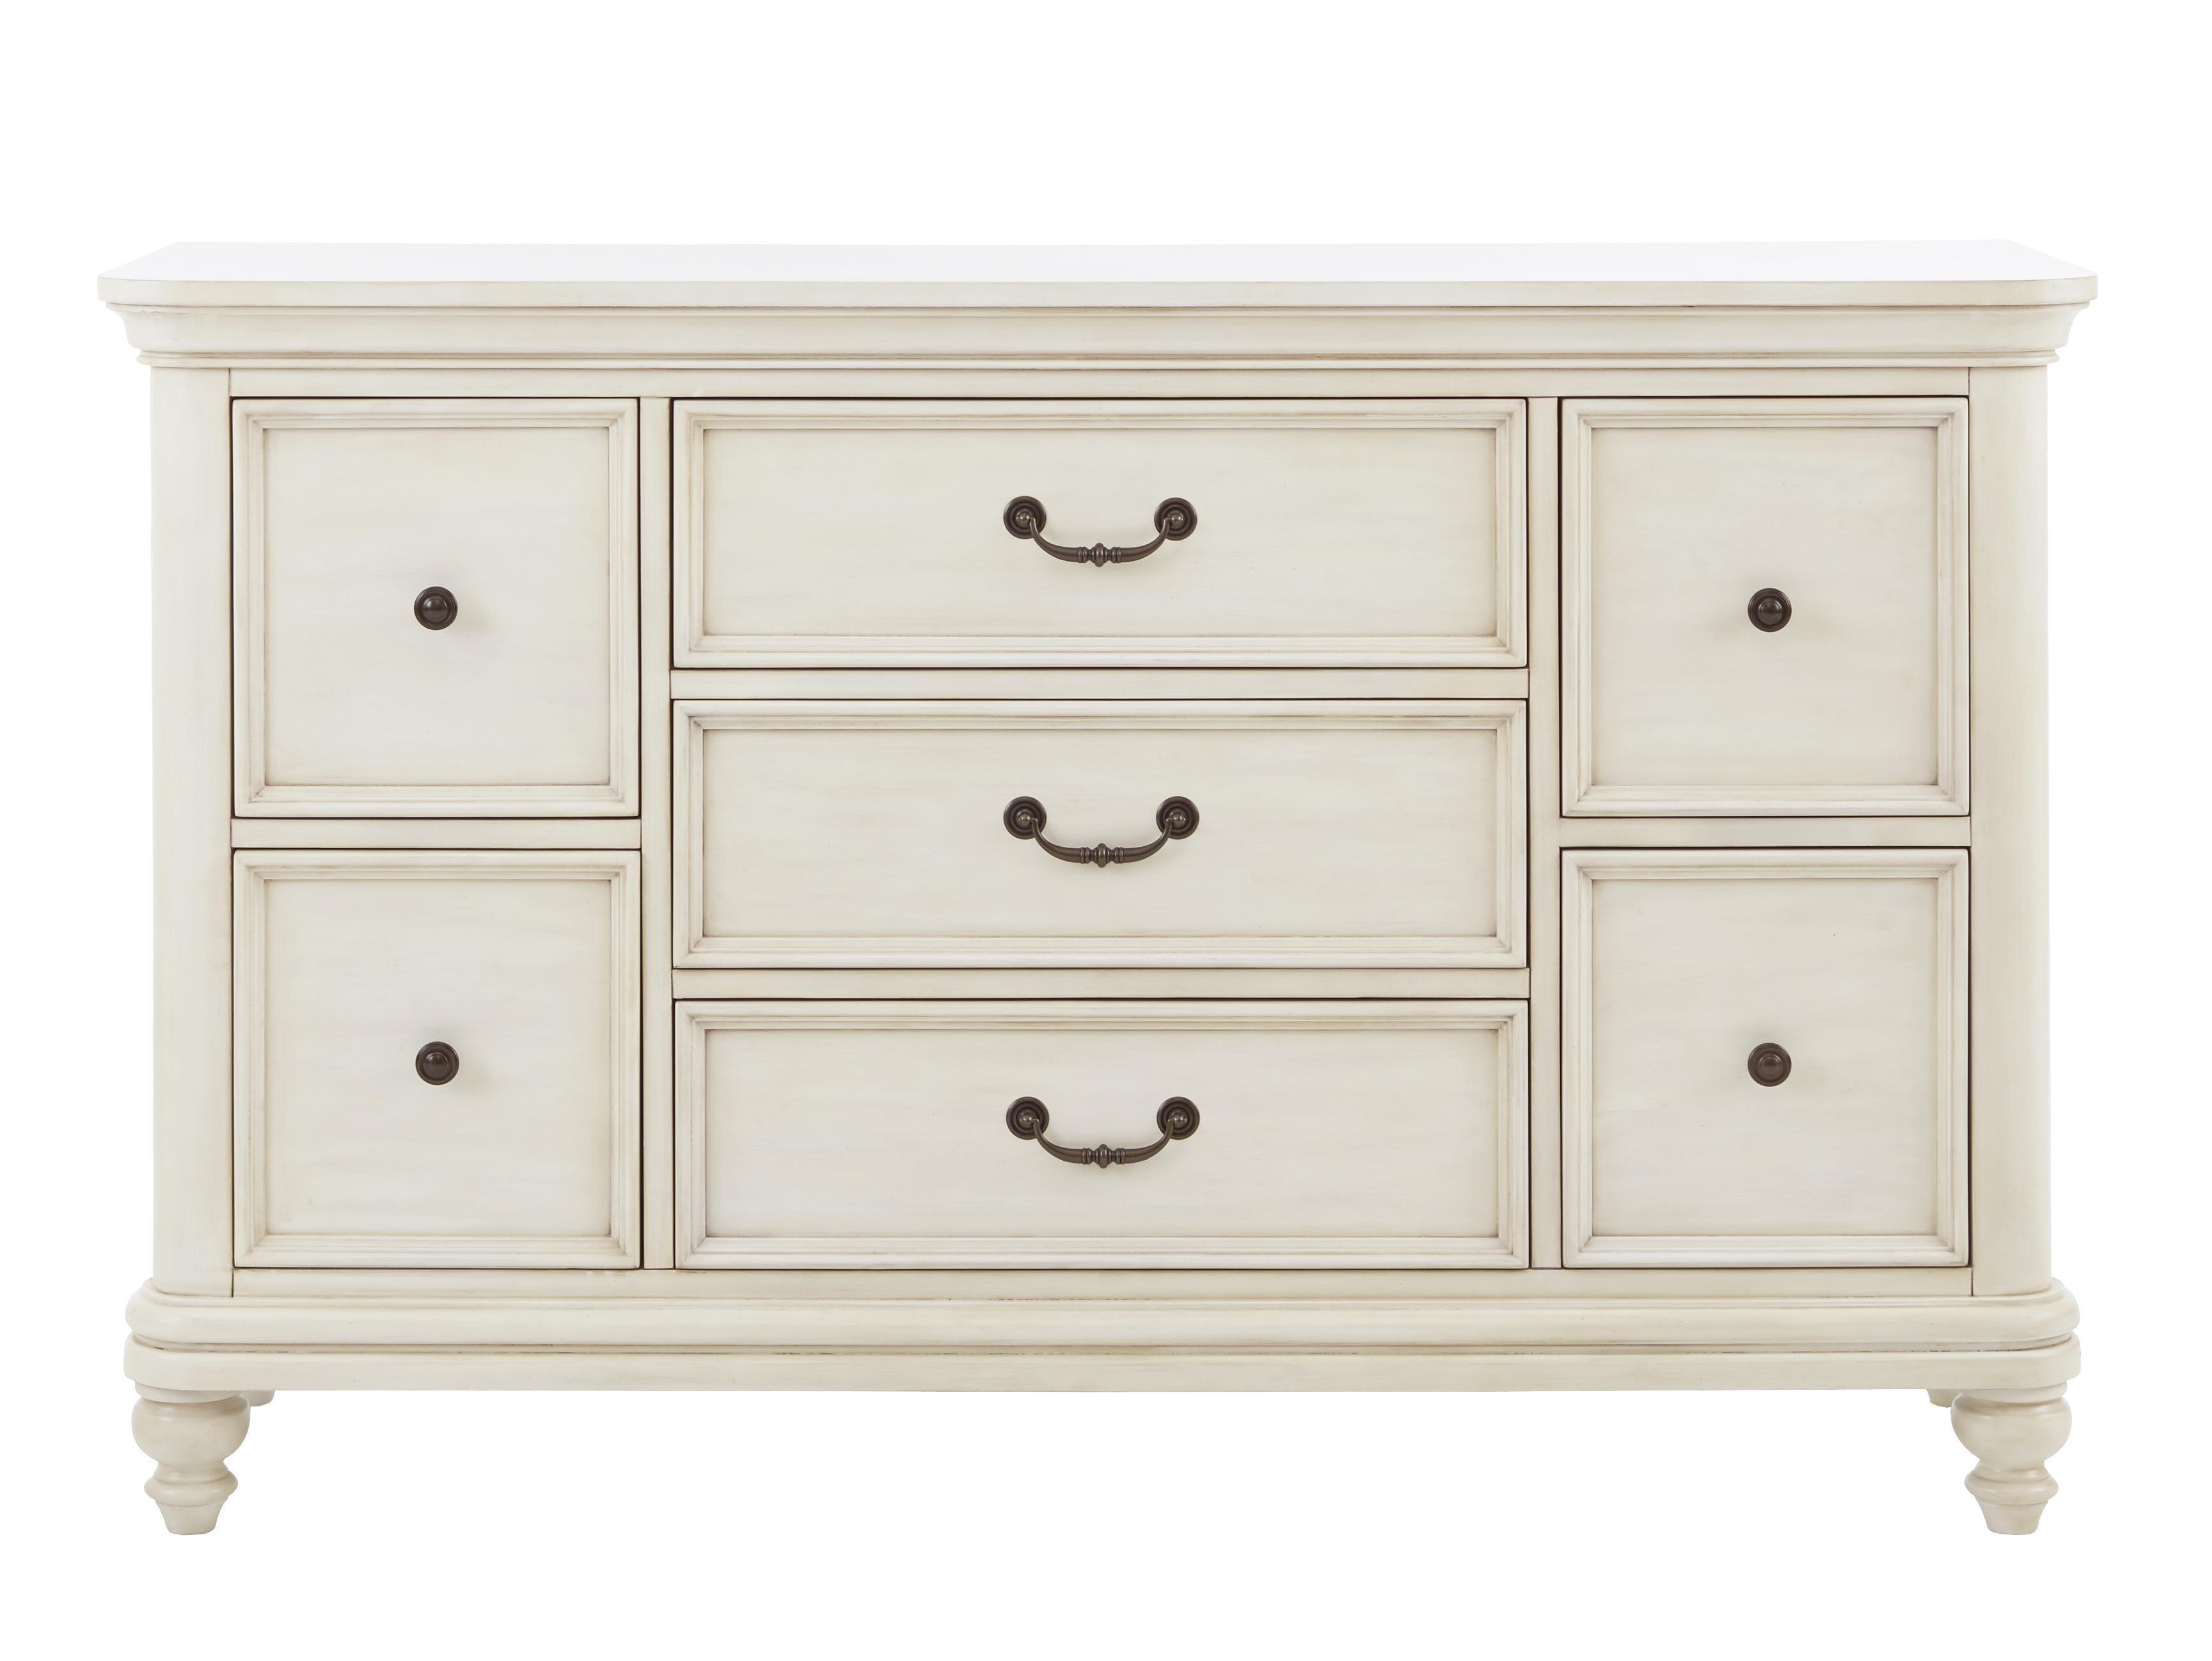 Kidz Gear Everly Drawer Dresser - Item Number: 8890-410